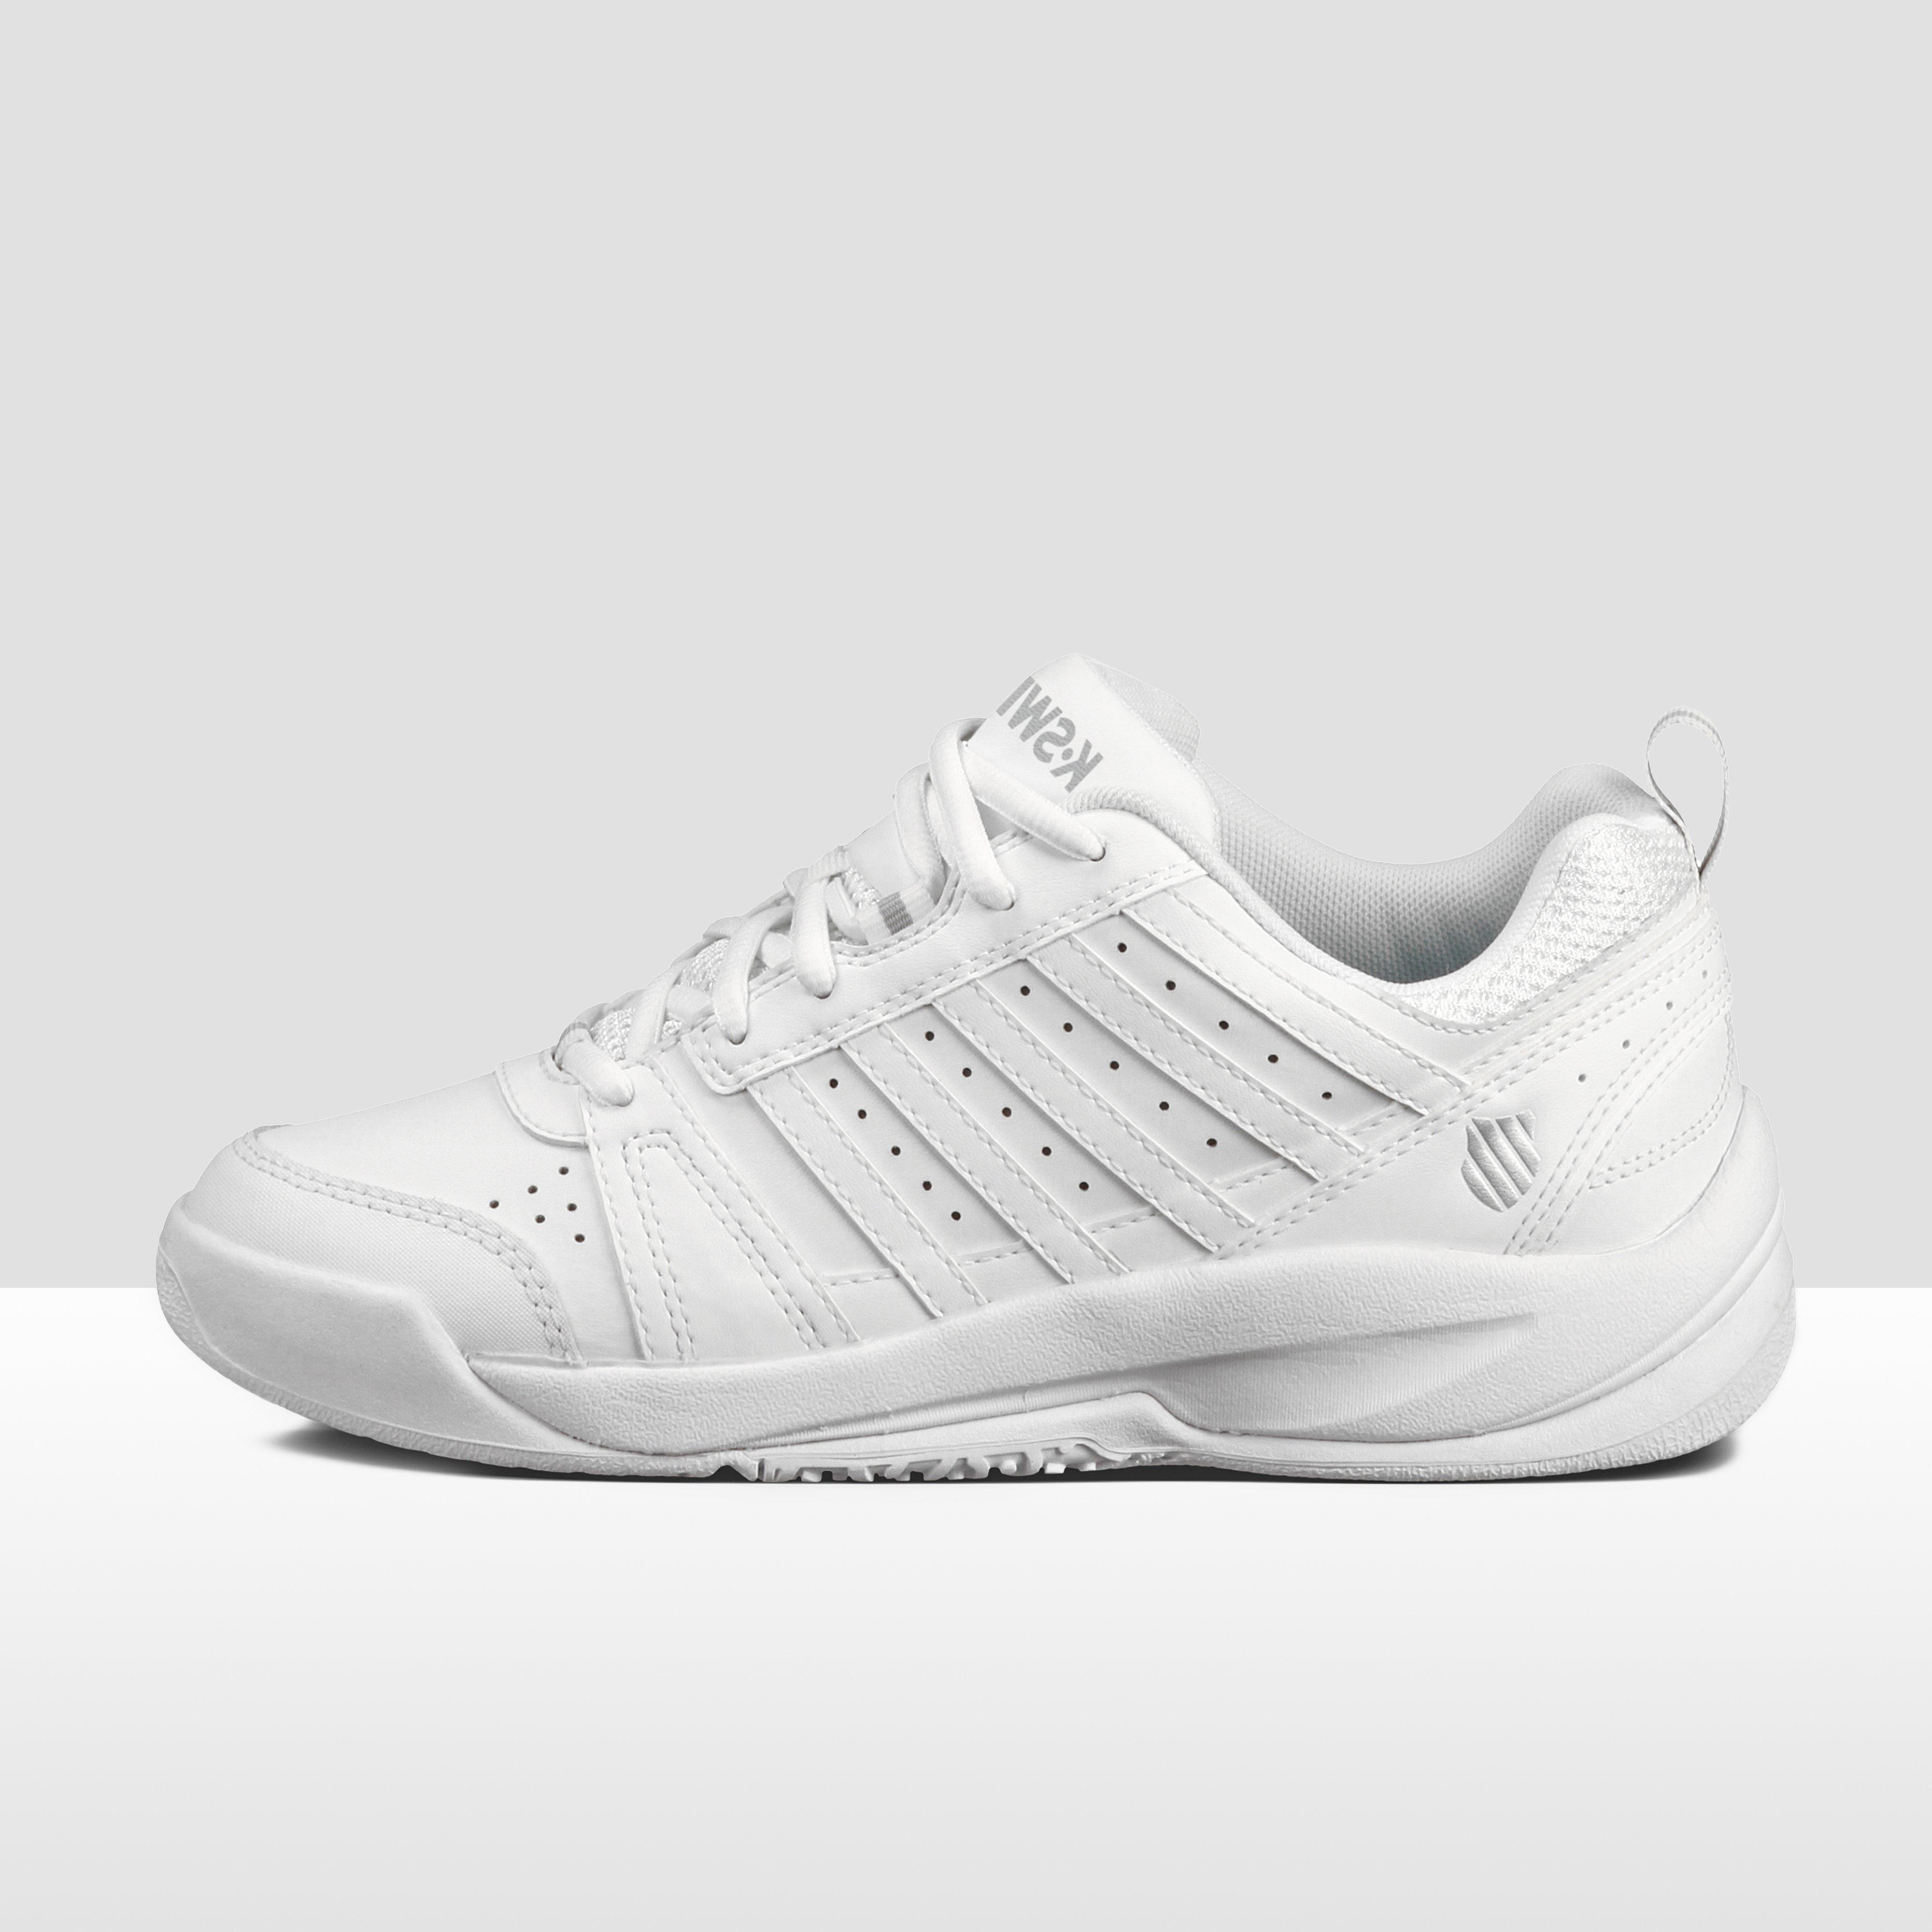 K-suisse - Vendy Ii Sp Chaussures Omni De Tennis - Femmes - Chaussures - Blanc - 40 mNCTYar